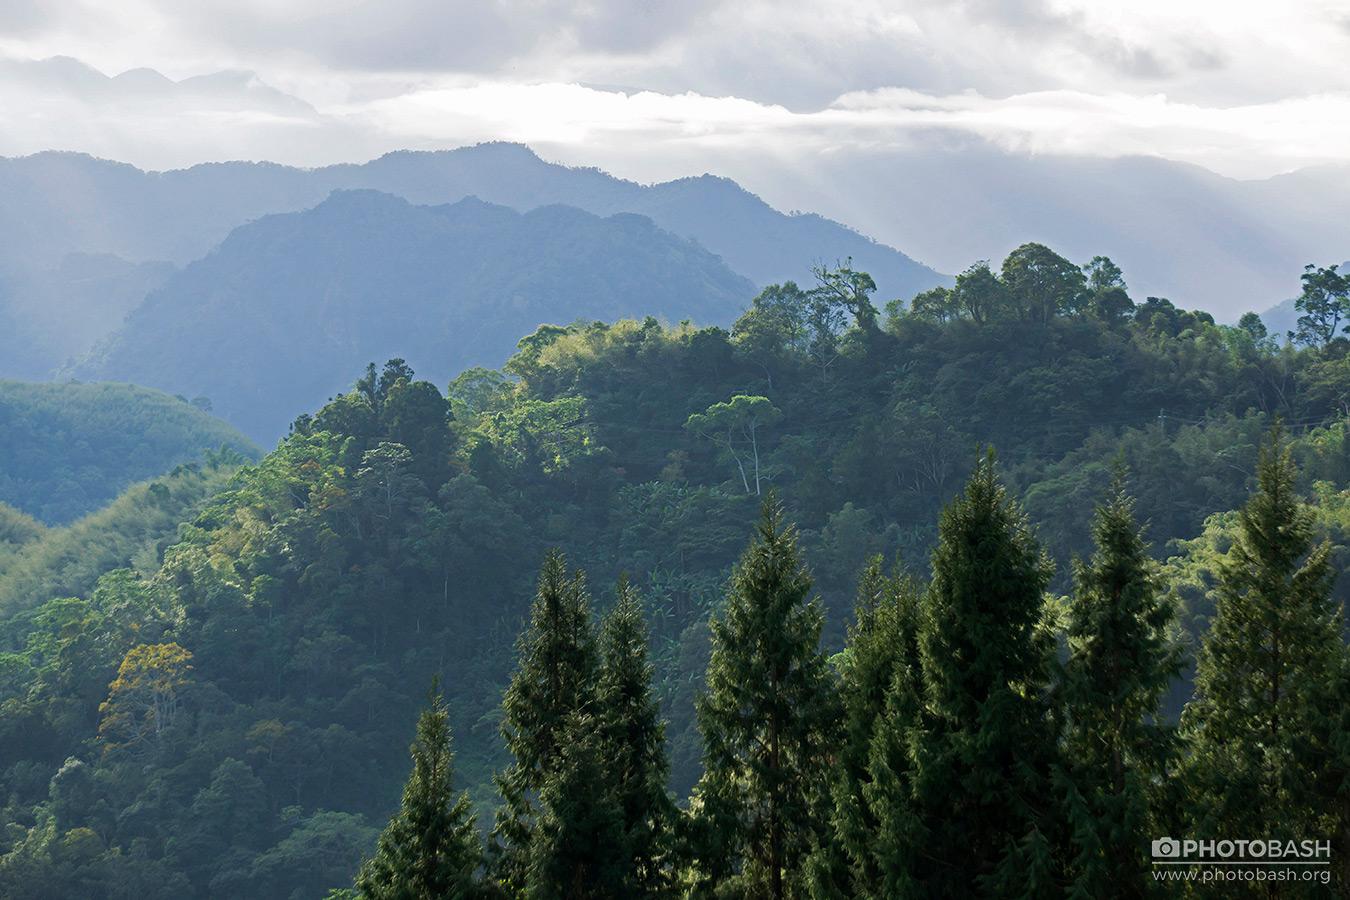 Alishan-Mountains-Misty-Valley-Trees.jpg